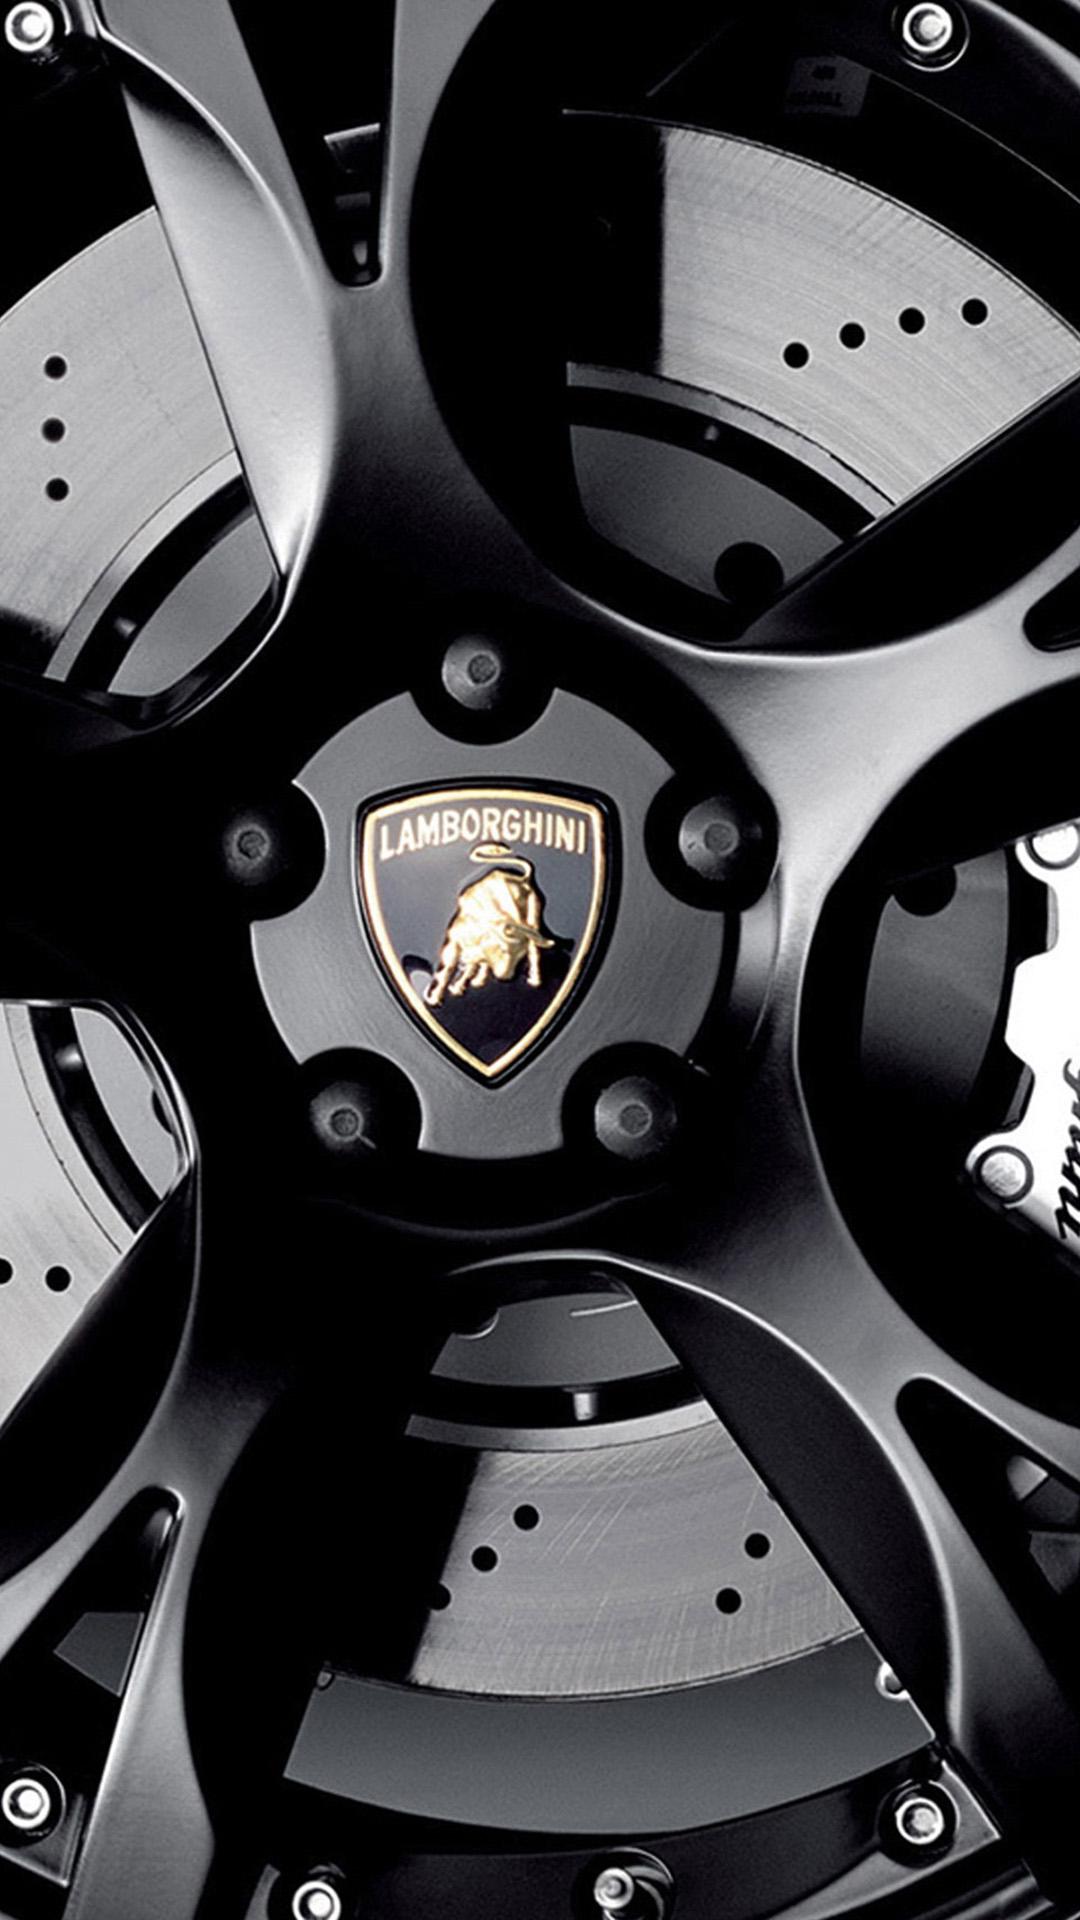 Lamborghini Logo Wallpaper Iphone 7 , HD Wallpaper & Backgrounds